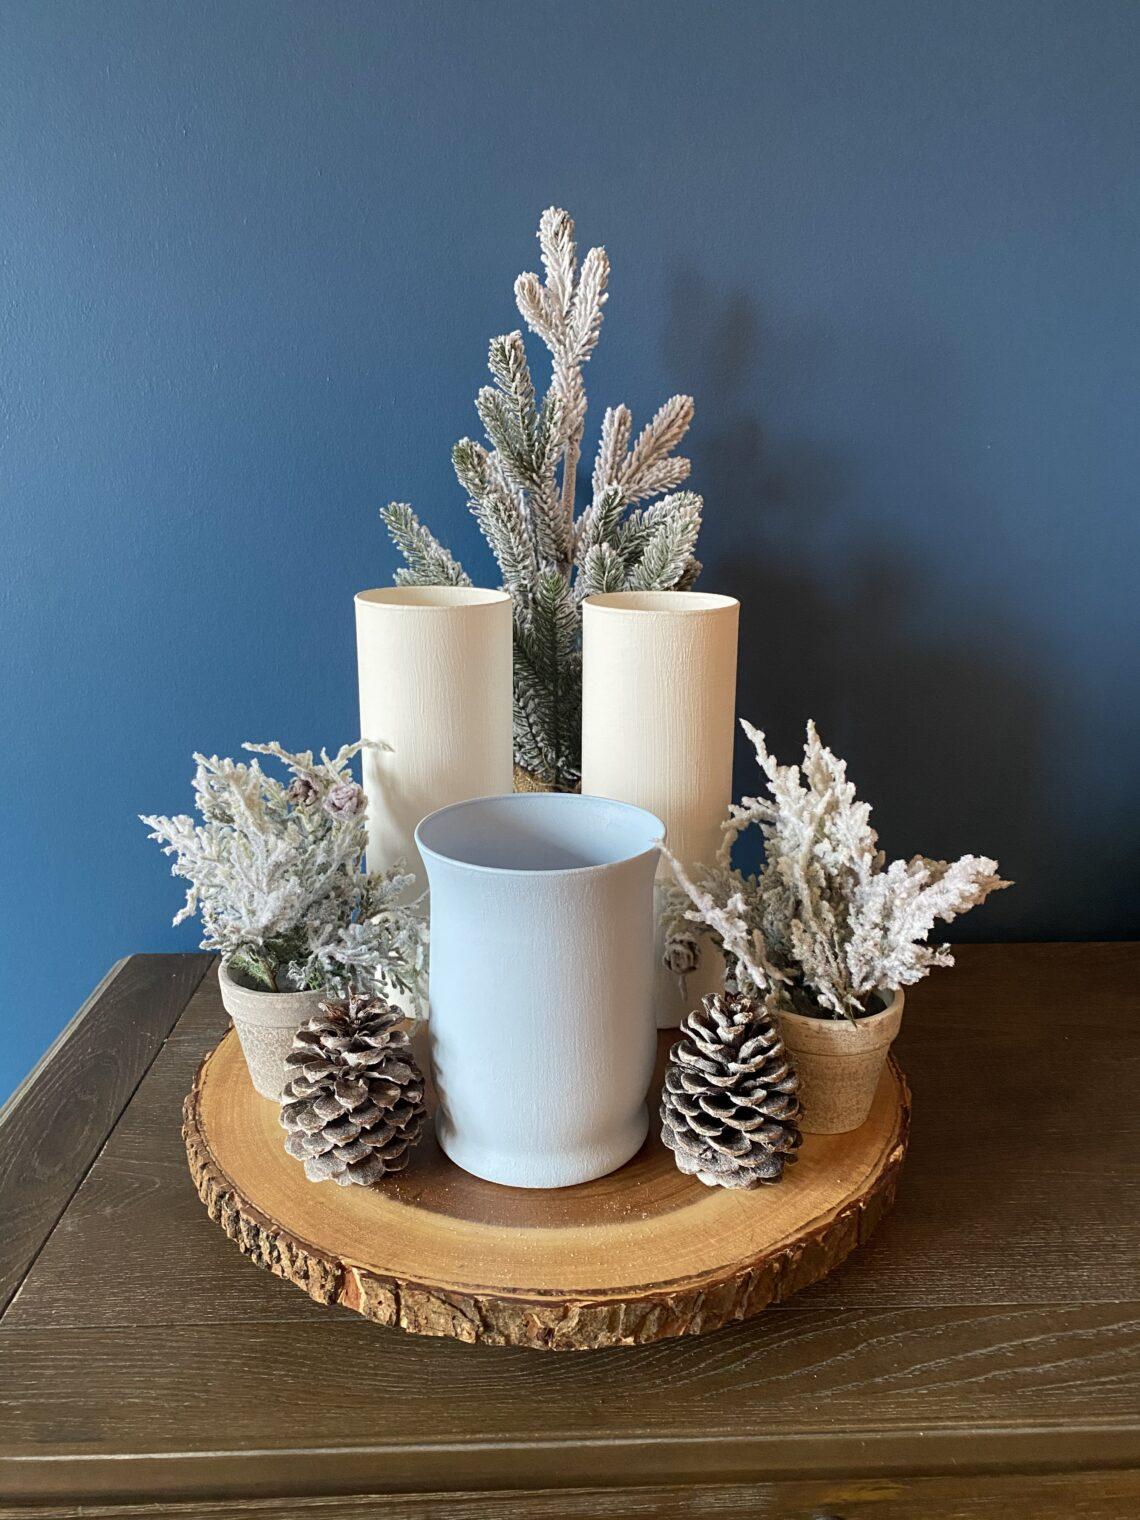 Terra cotta look vase DIY